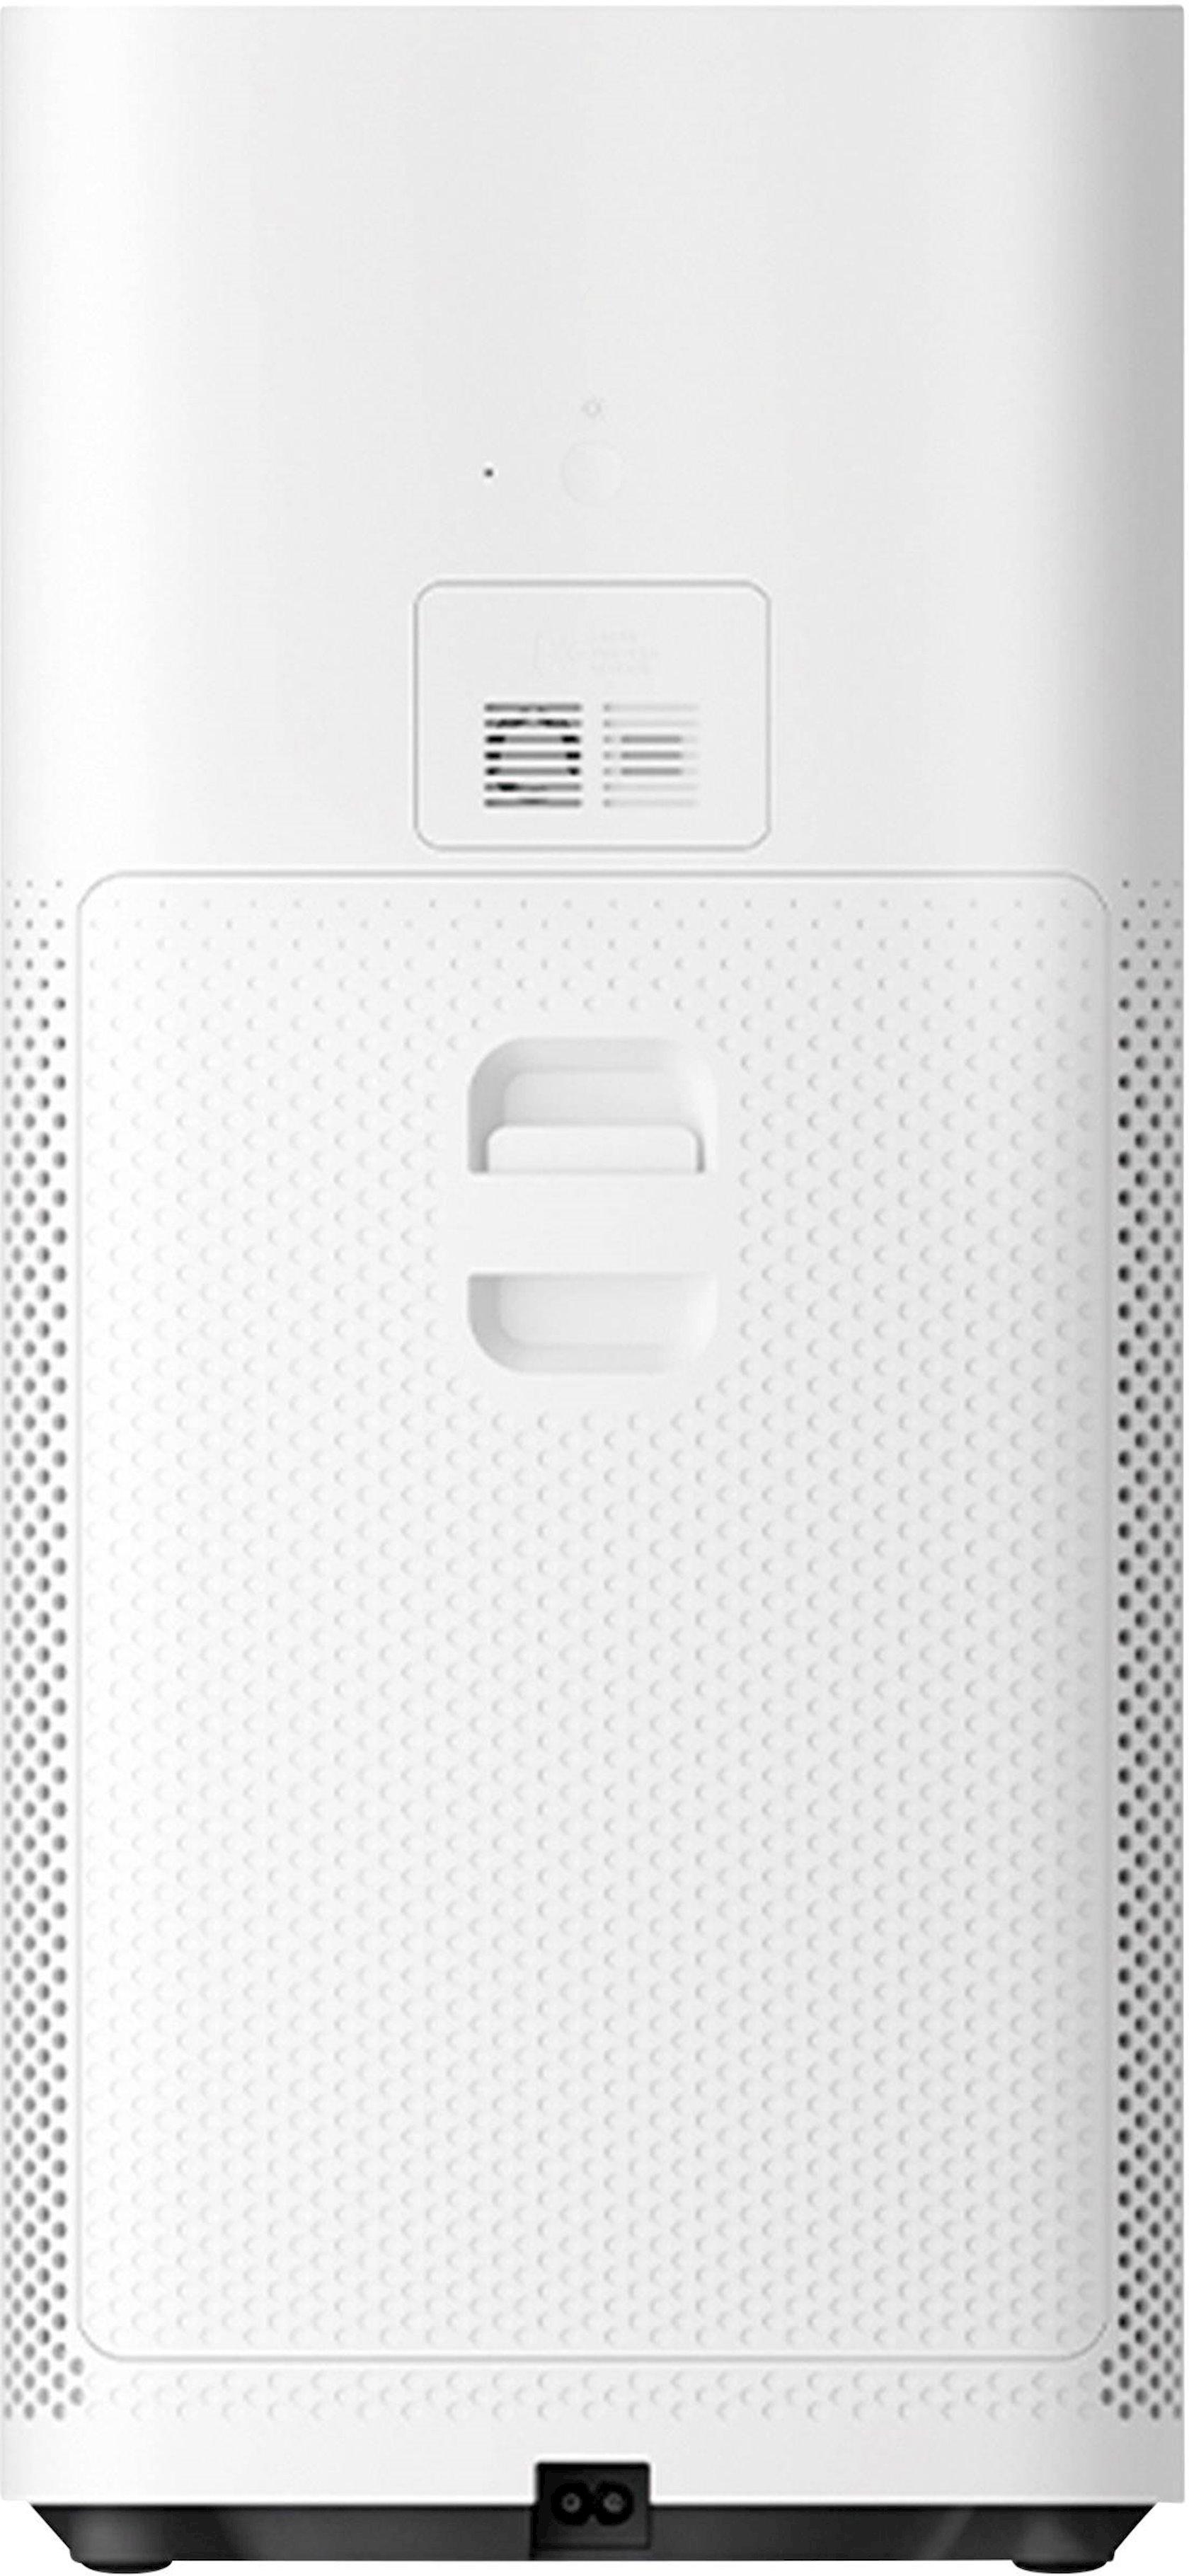 Hava Təmizləyicisi  Xiaomi Mi Air Purifier 3H